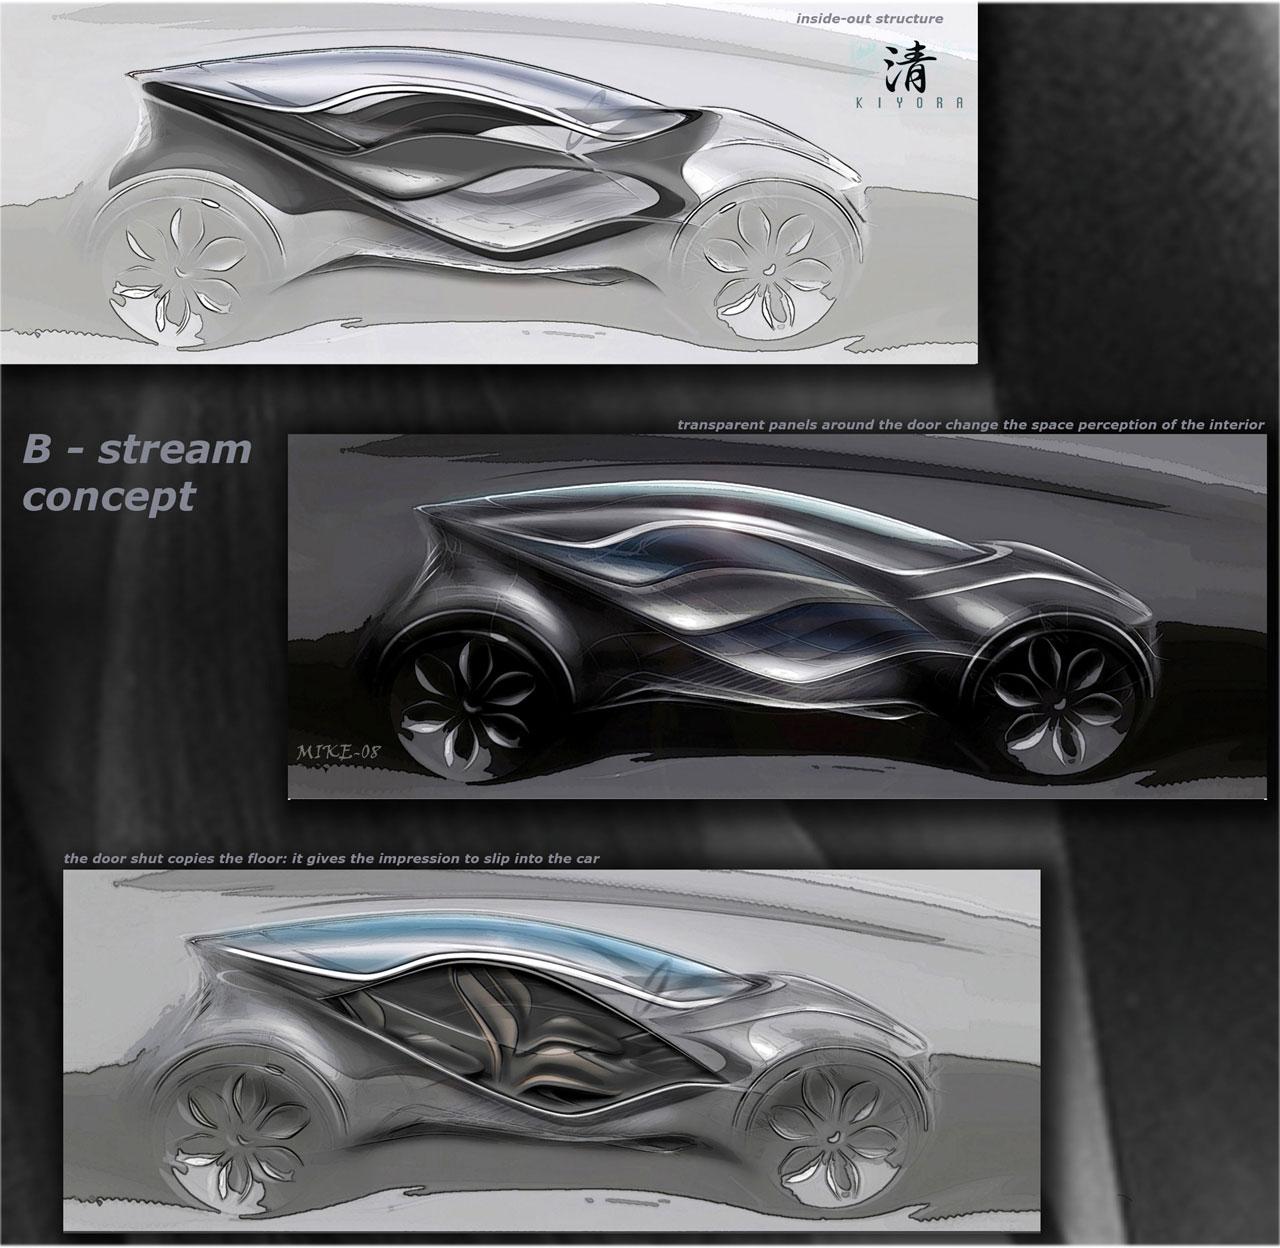 http://www.carstyling.ru/resources/concept/large/2008Mazda_Kiyora_Sketch_04.jpg